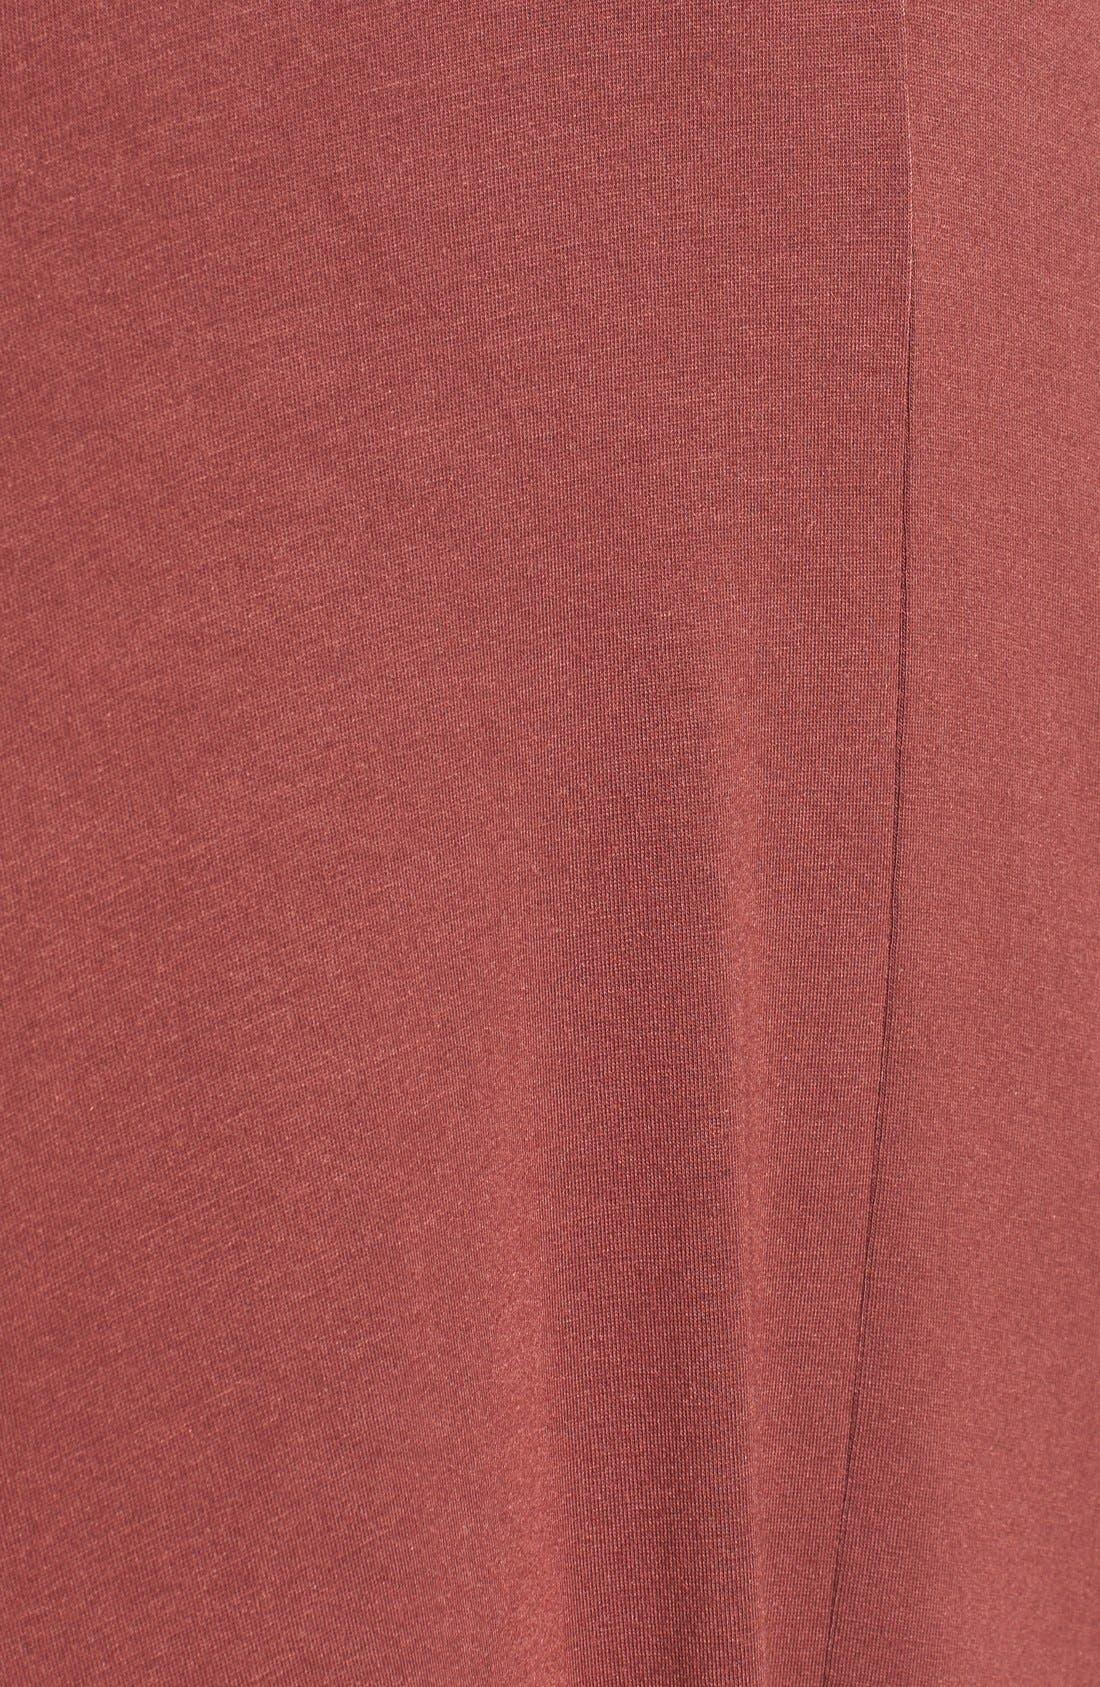 Alternate Image 5  - Leith Circle Midi Skirt